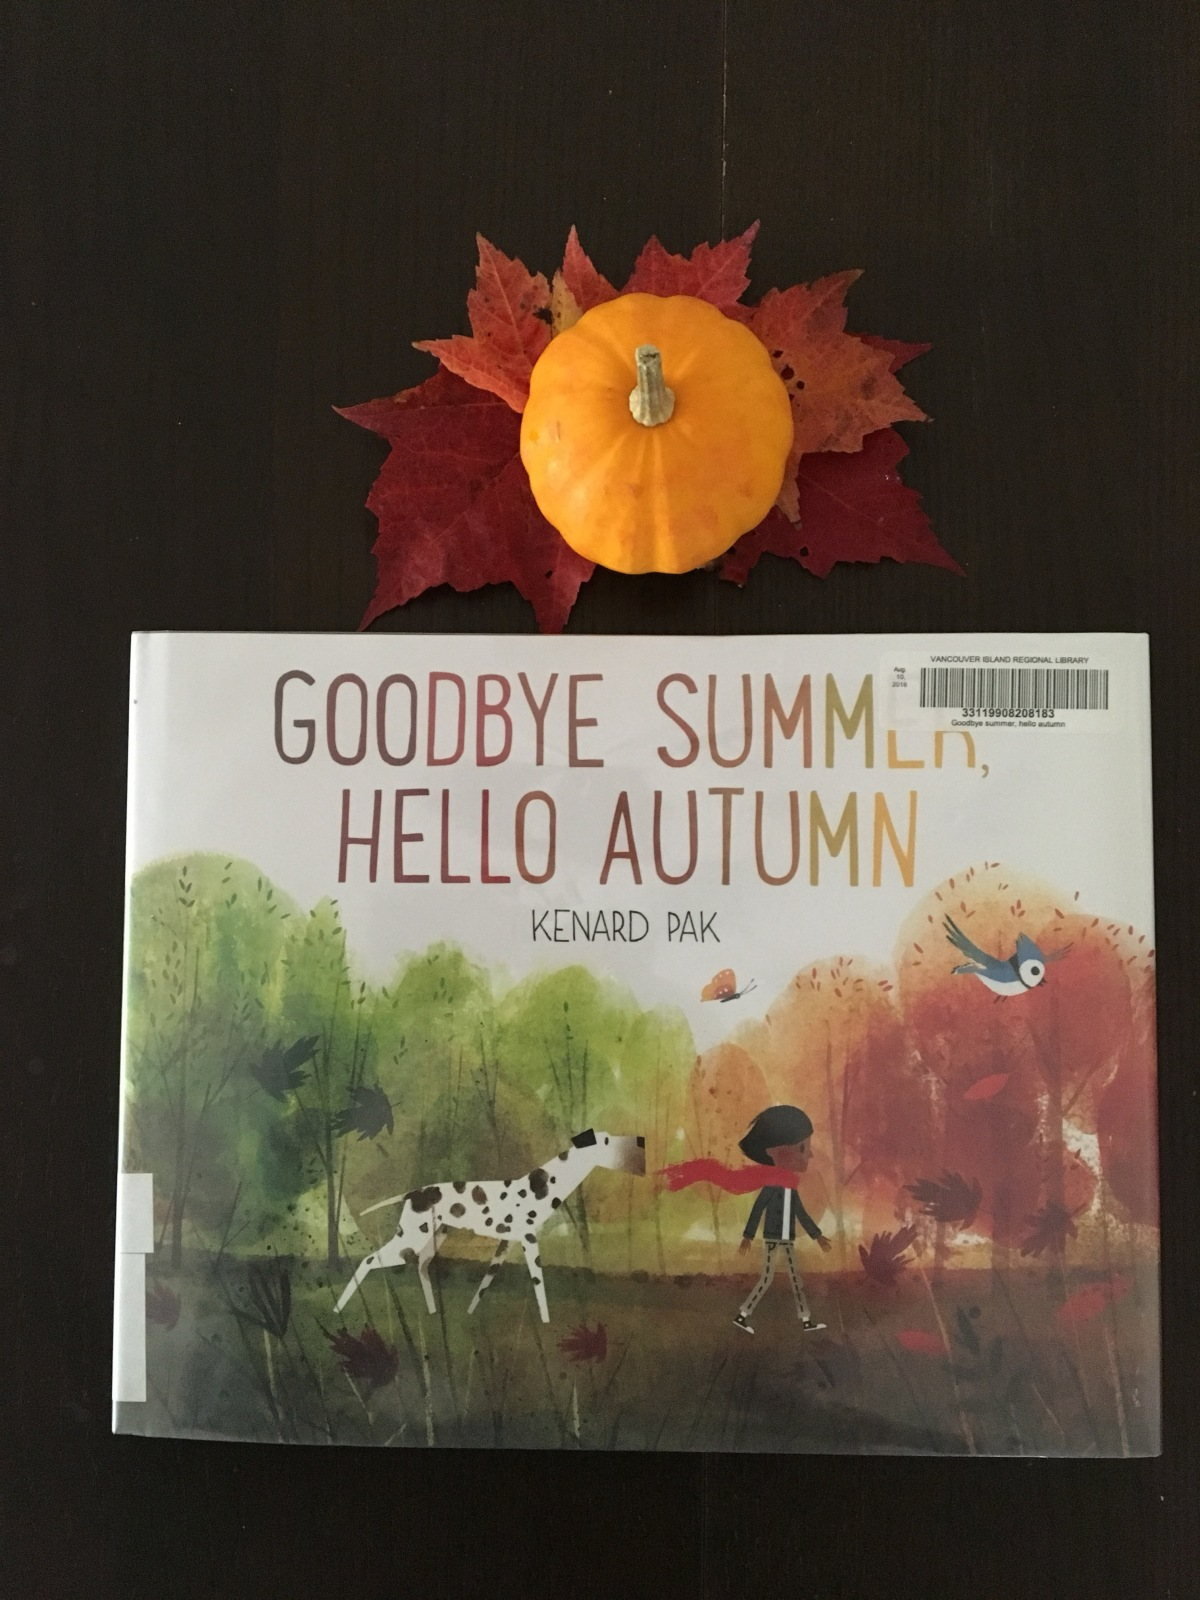 Sunday Book Club: Autumn favourites